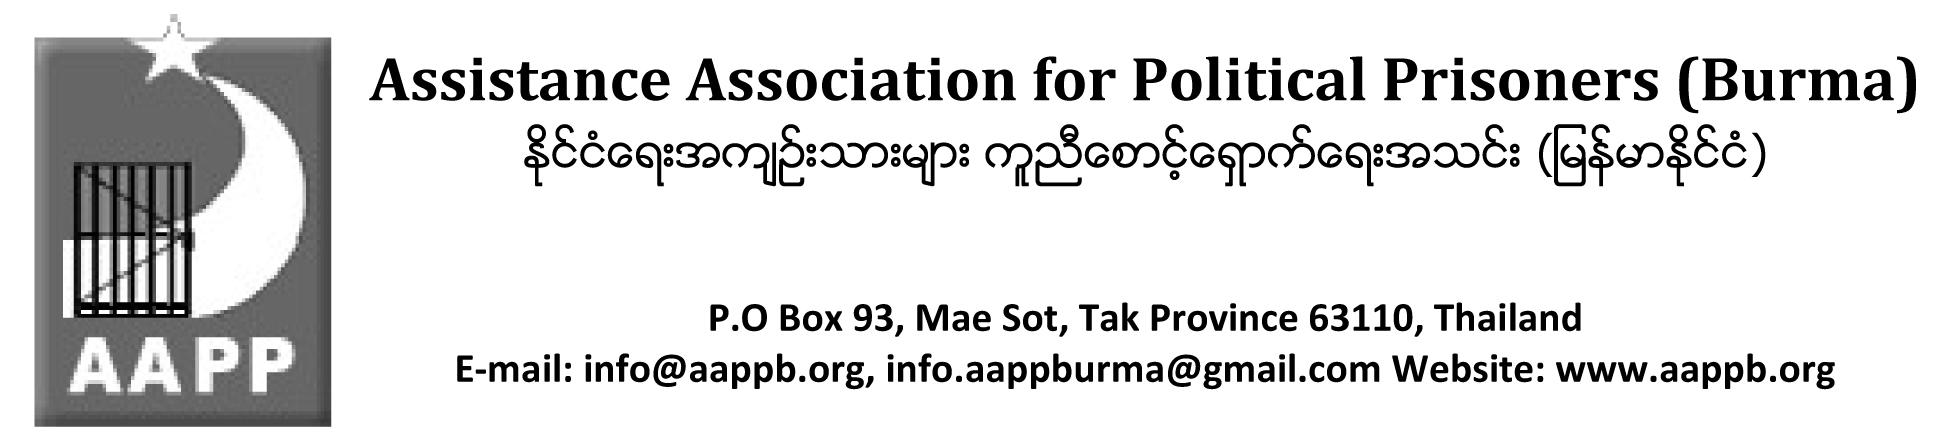 AAPP New Letterhead